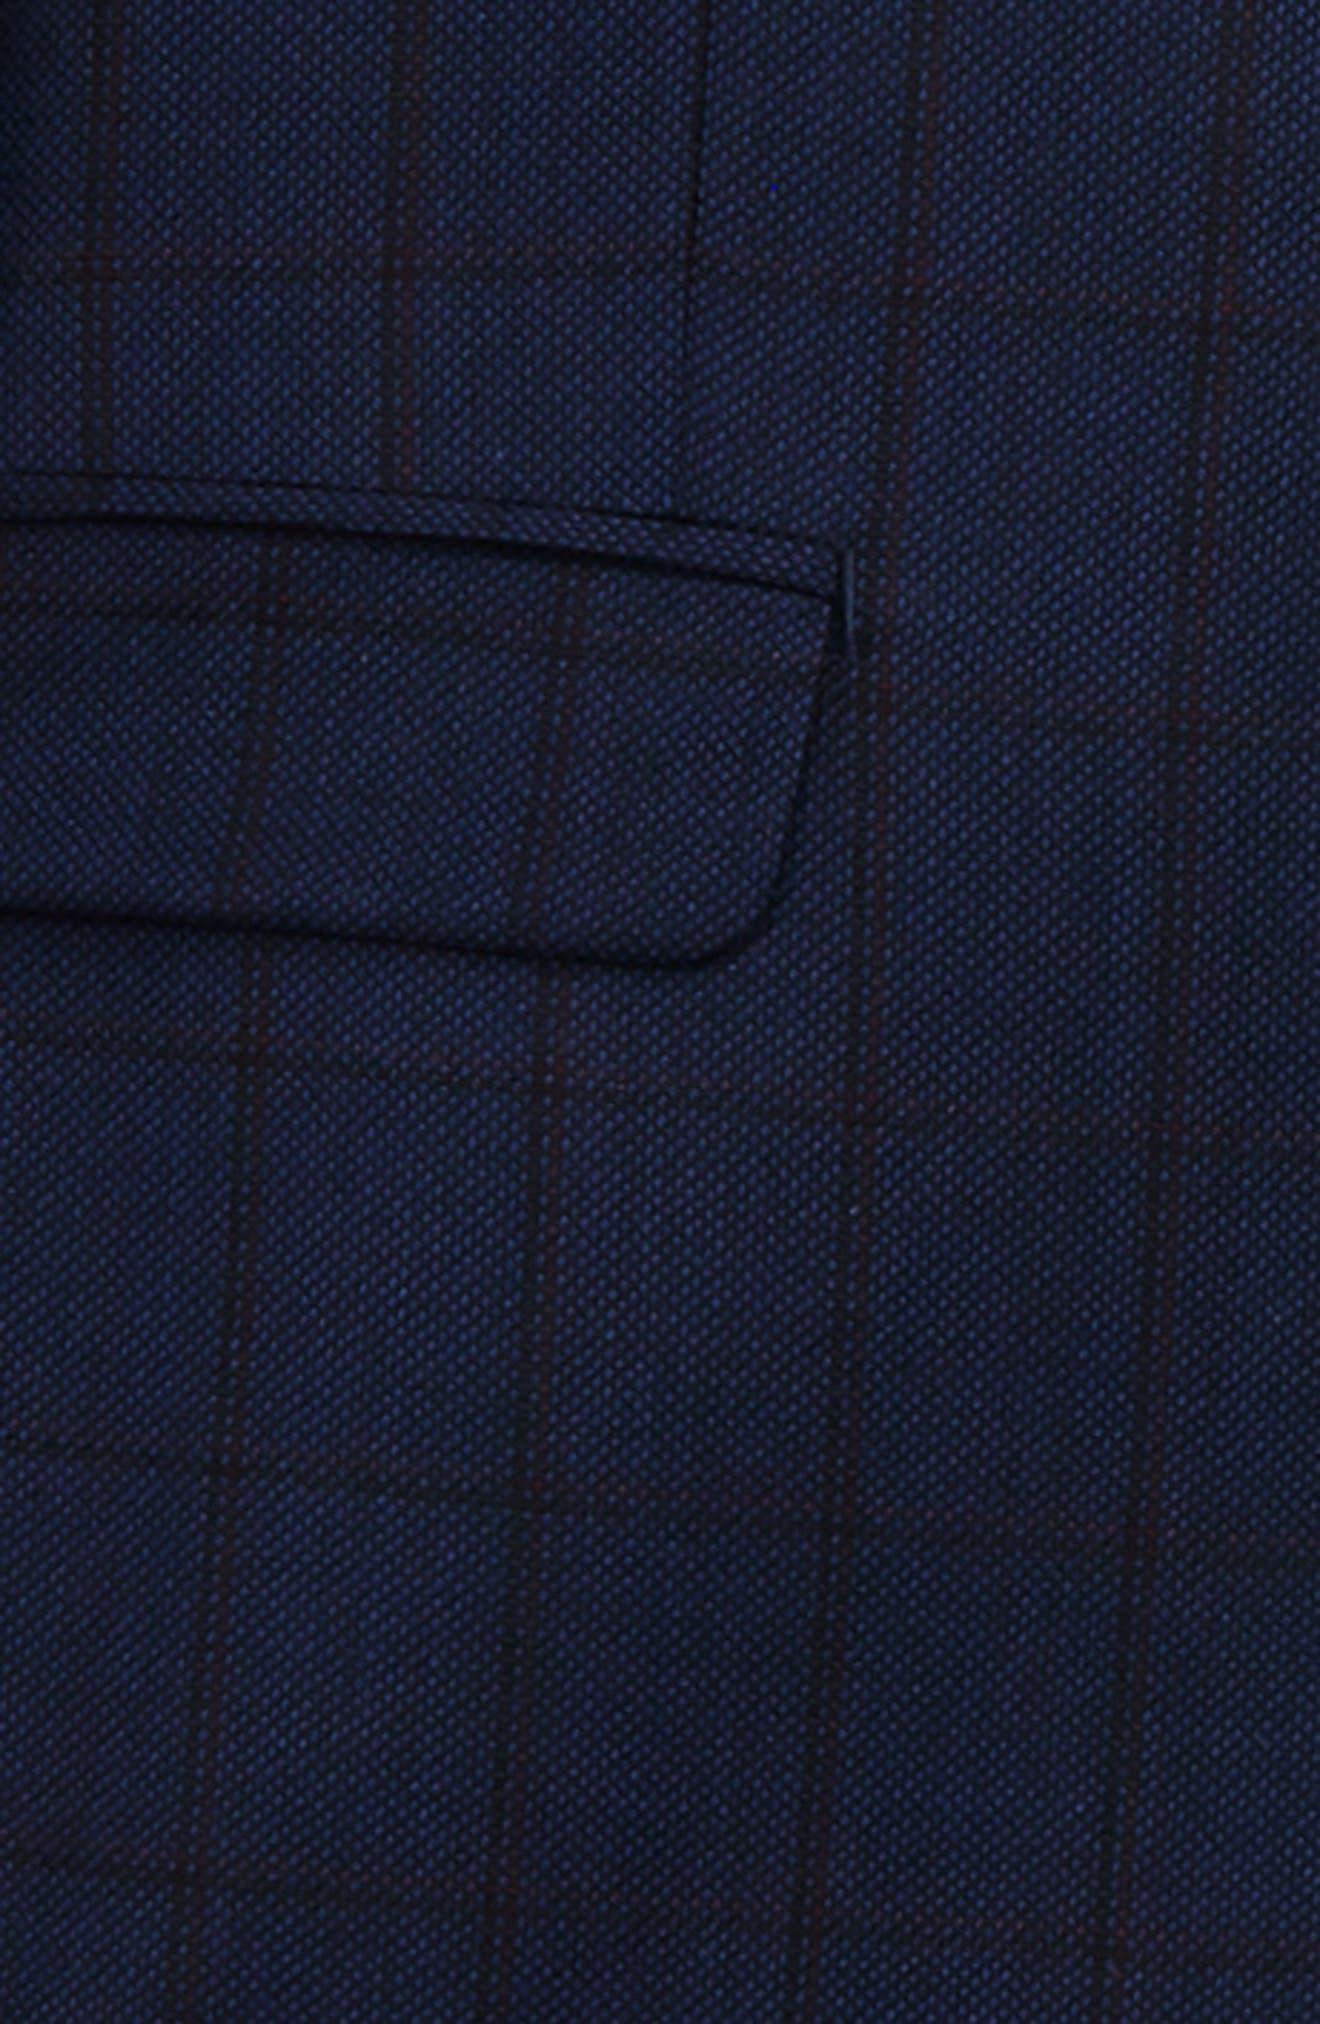 Windowpane Wool Suit,                             Alternate thumbnail 2, color,                             410